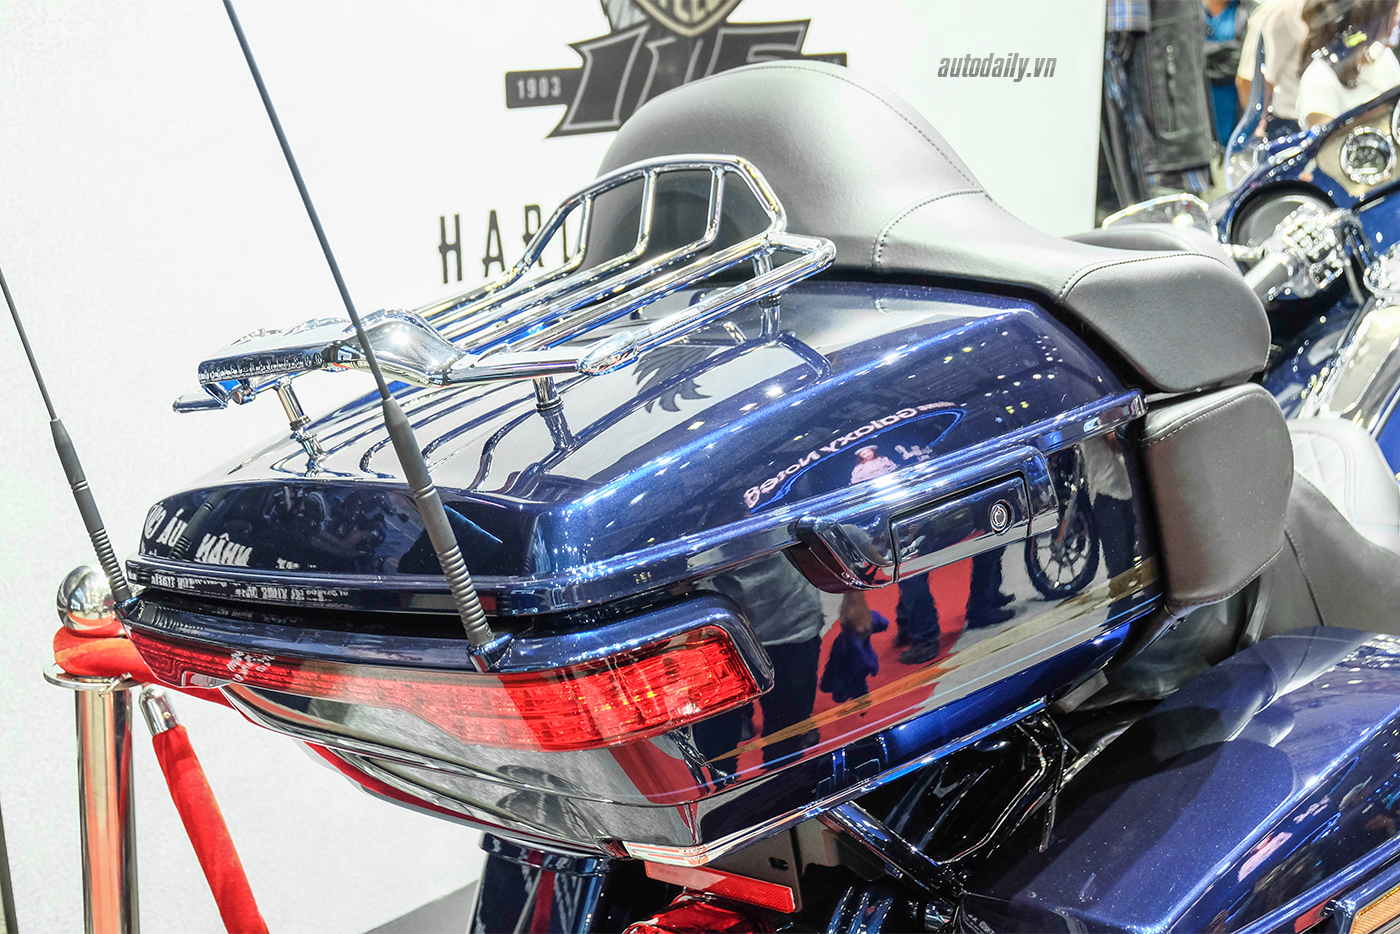 harley-davidson-cvo-limited-1.jpg